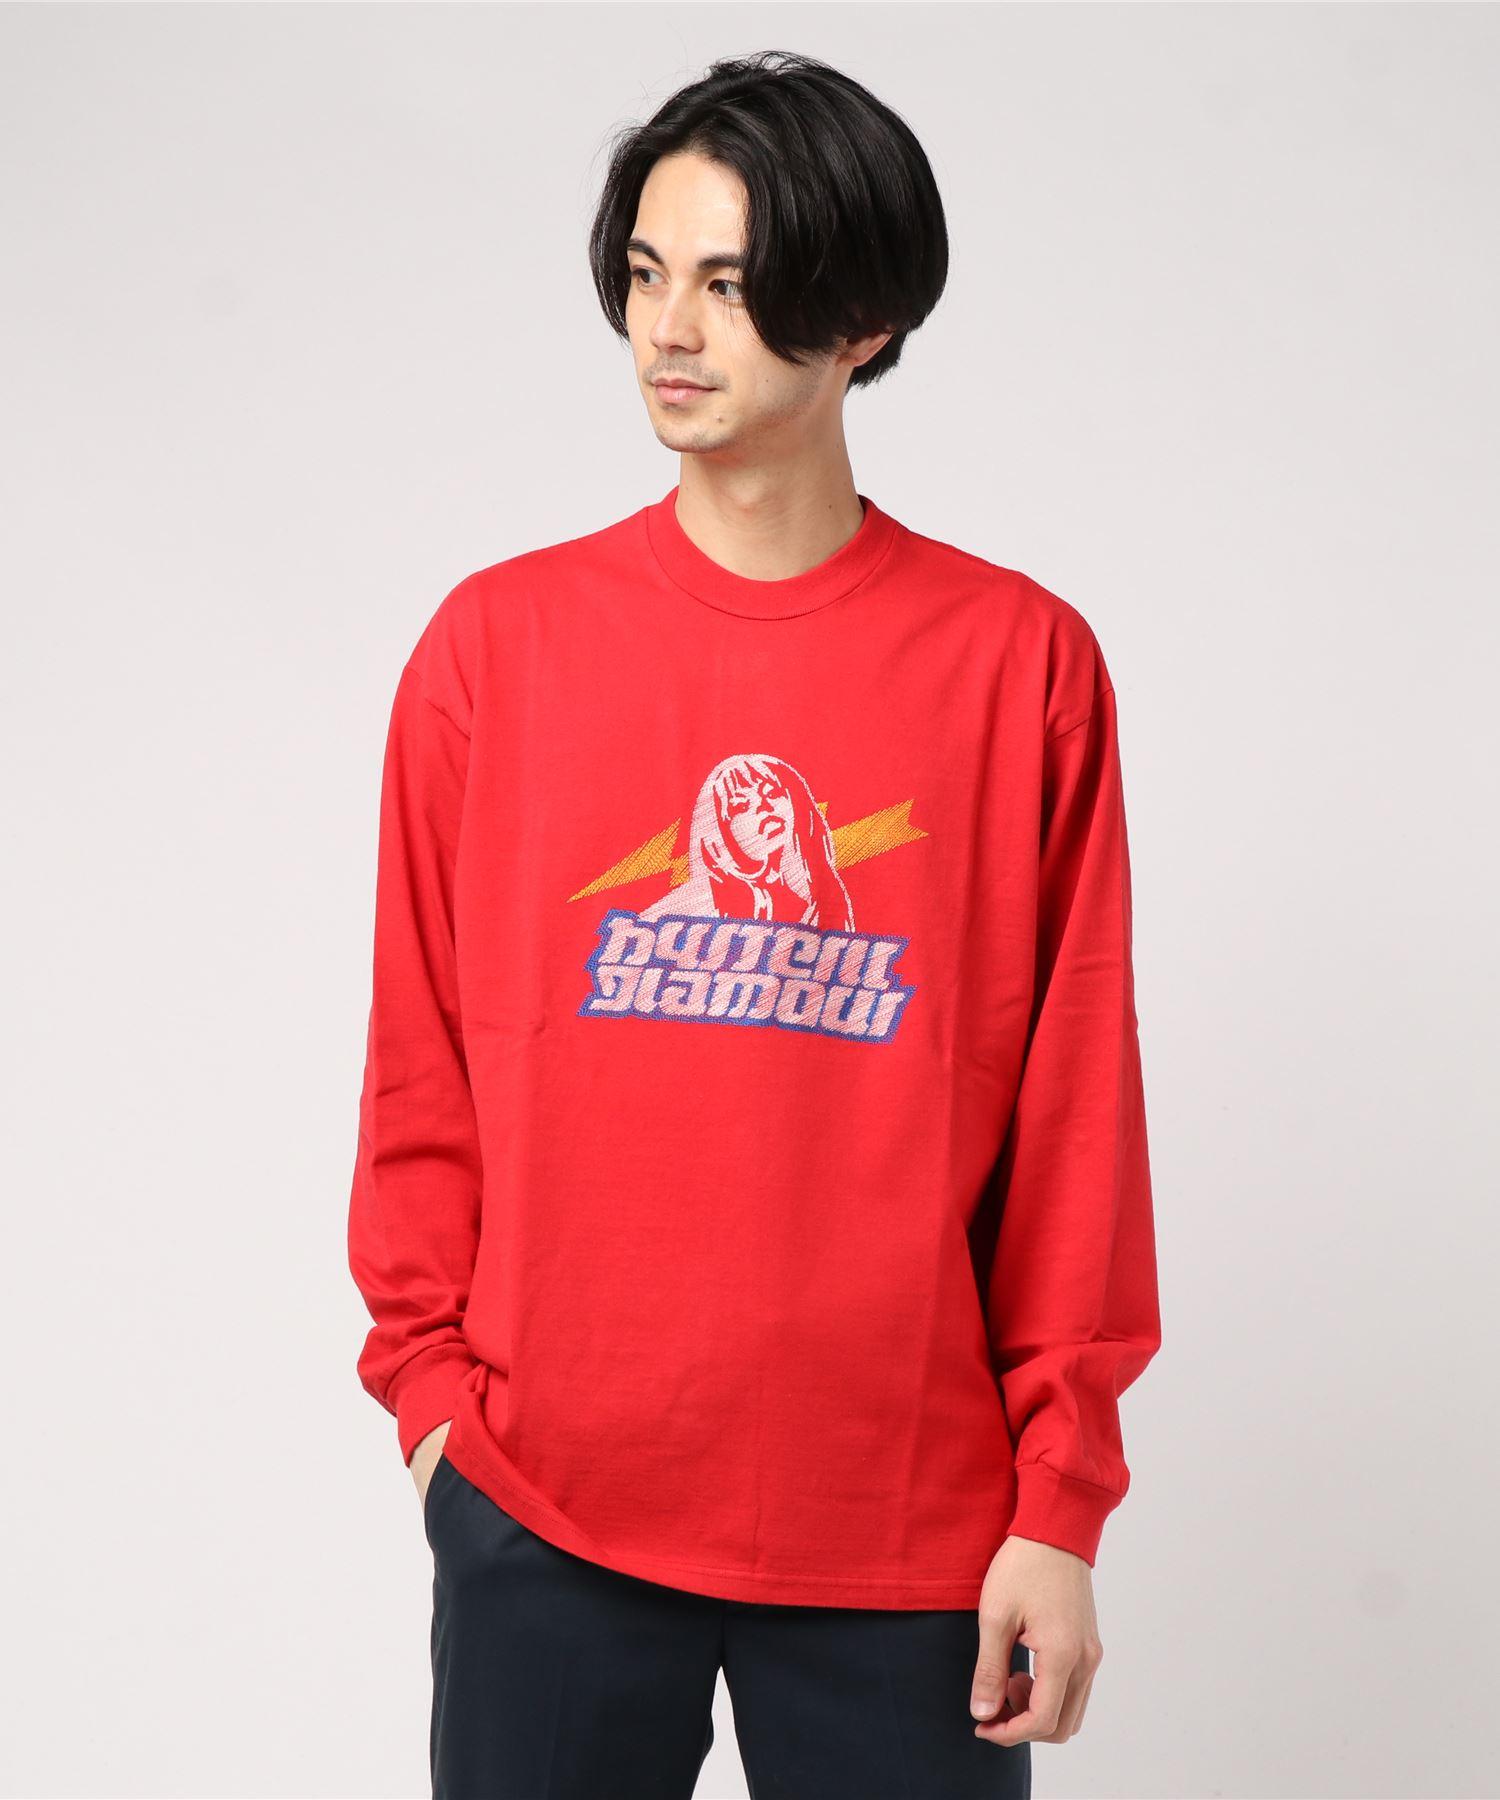 LADYLAND ACADEMY刺繍 リブ付Tシャツ